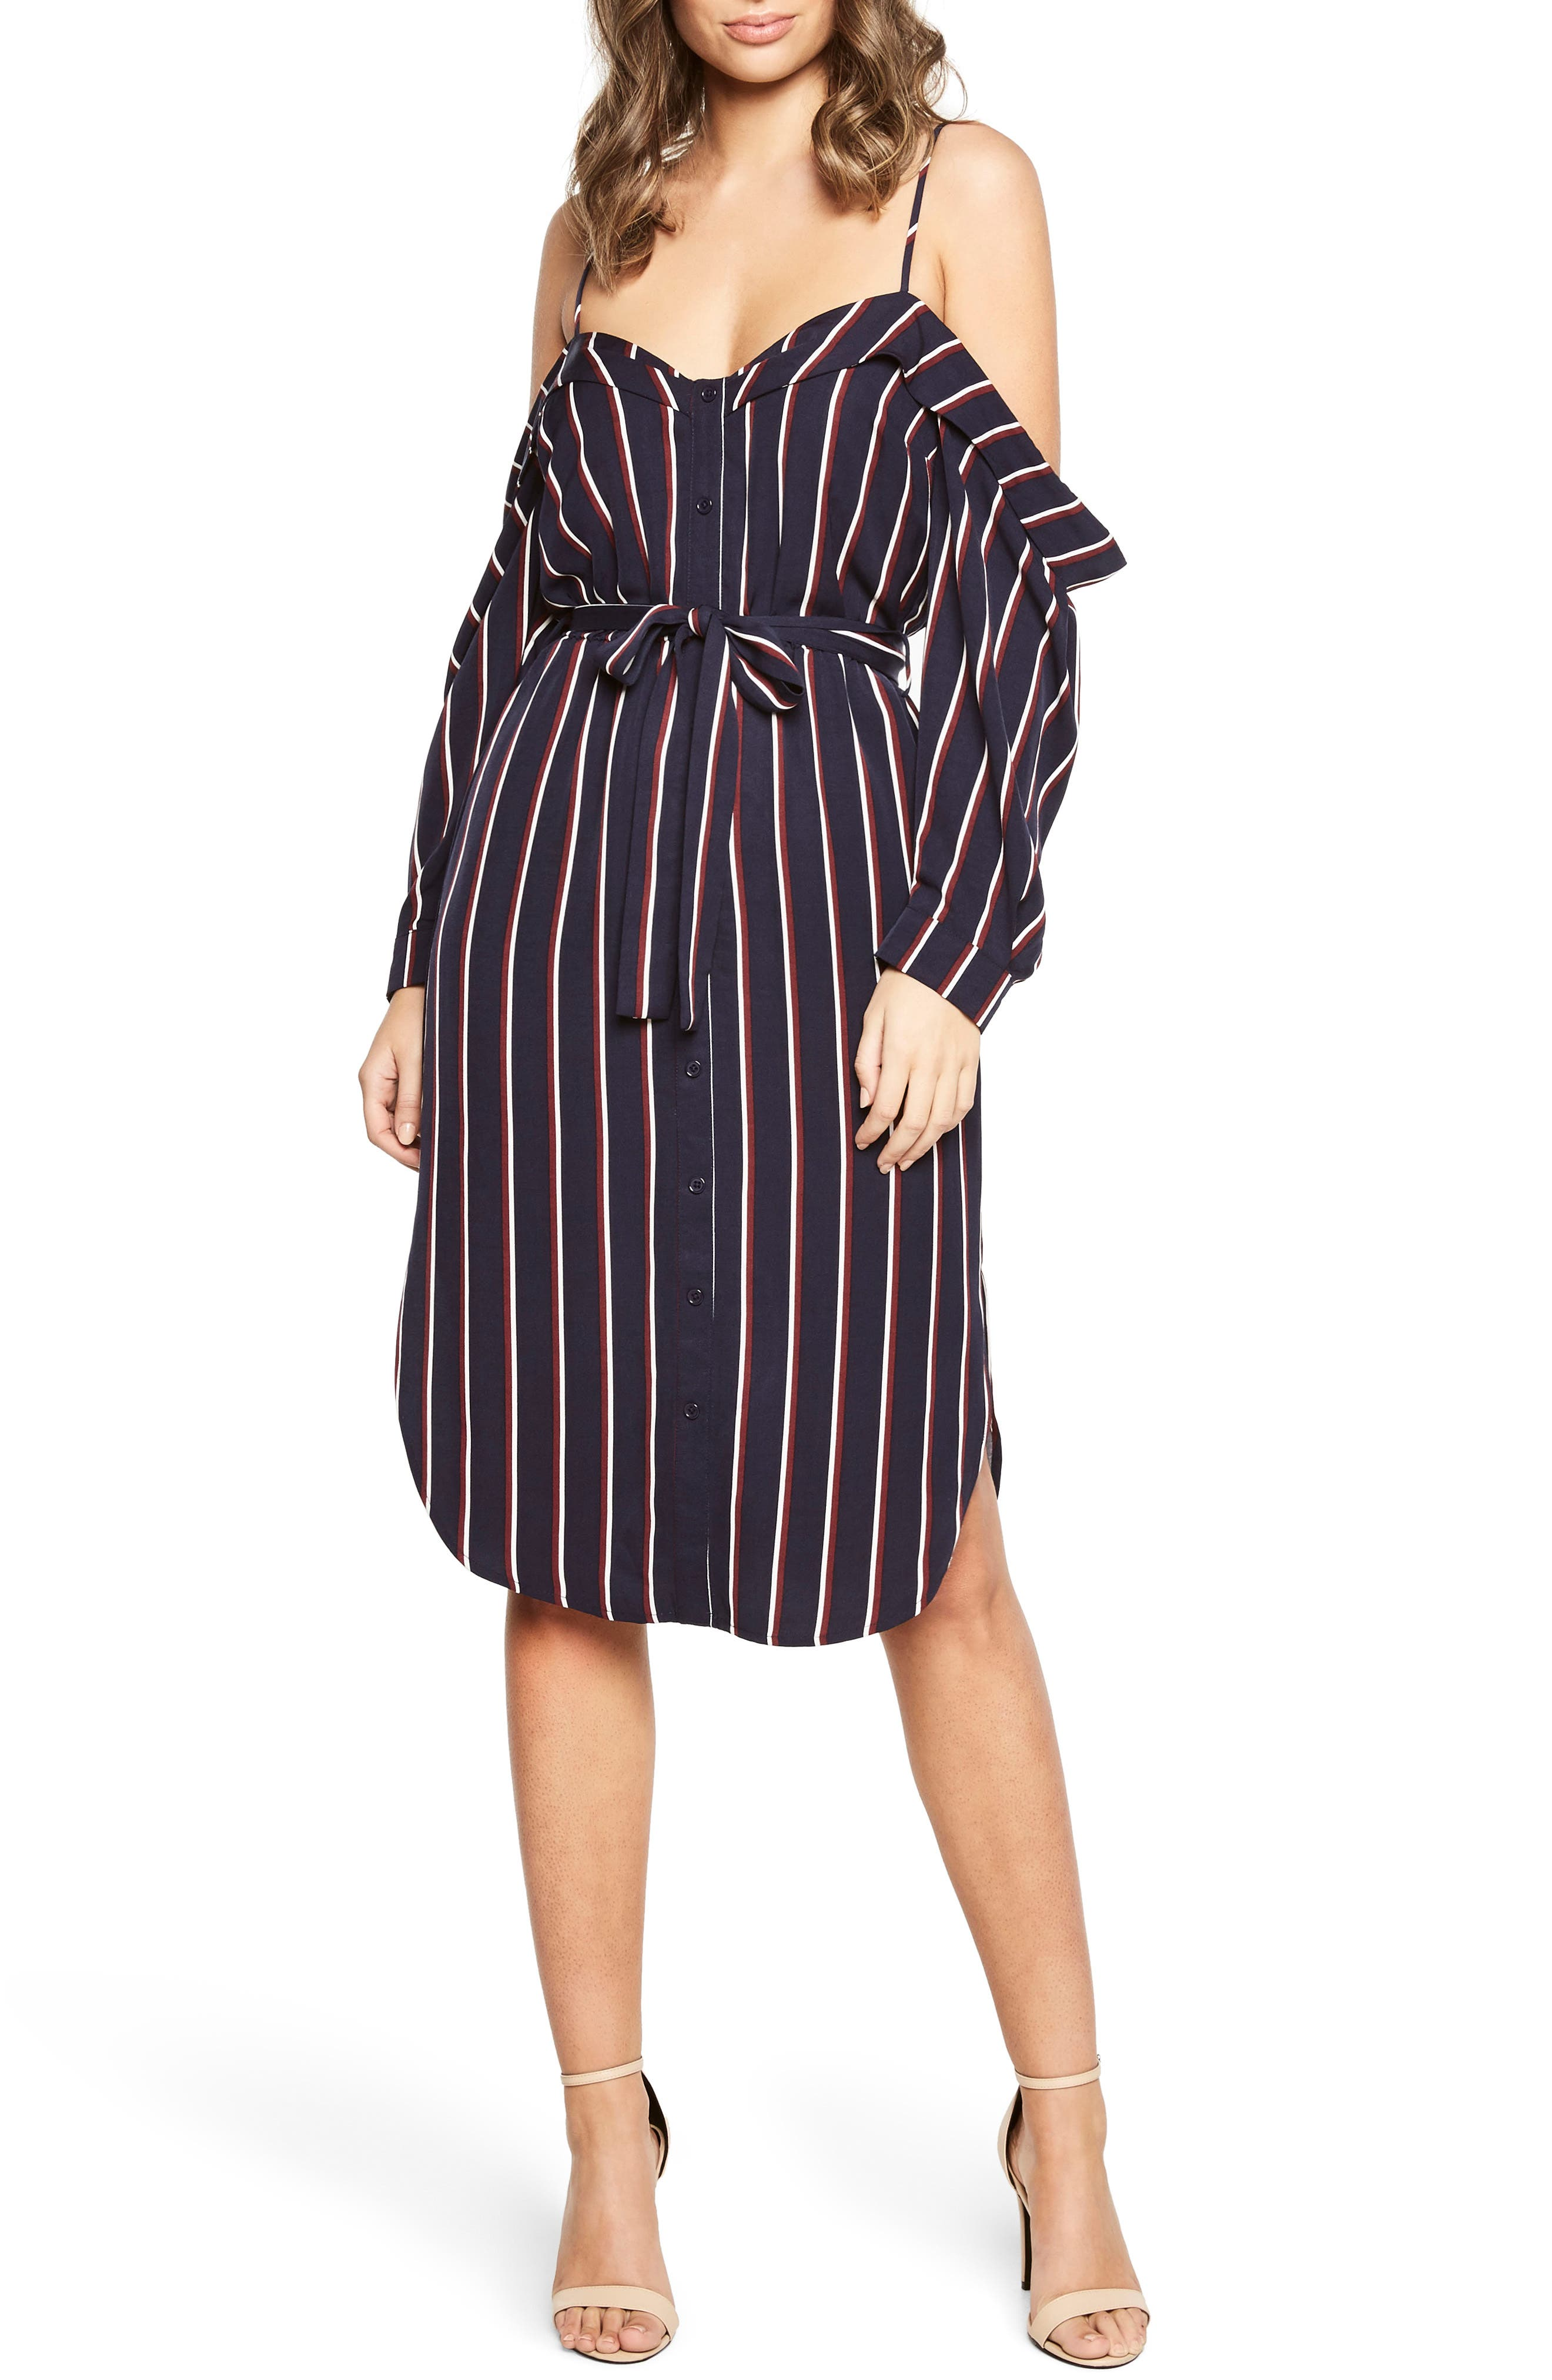 Paloma Off the Shoulder Dress,                             Main thumbnail 1, color,                             Navy Stripe